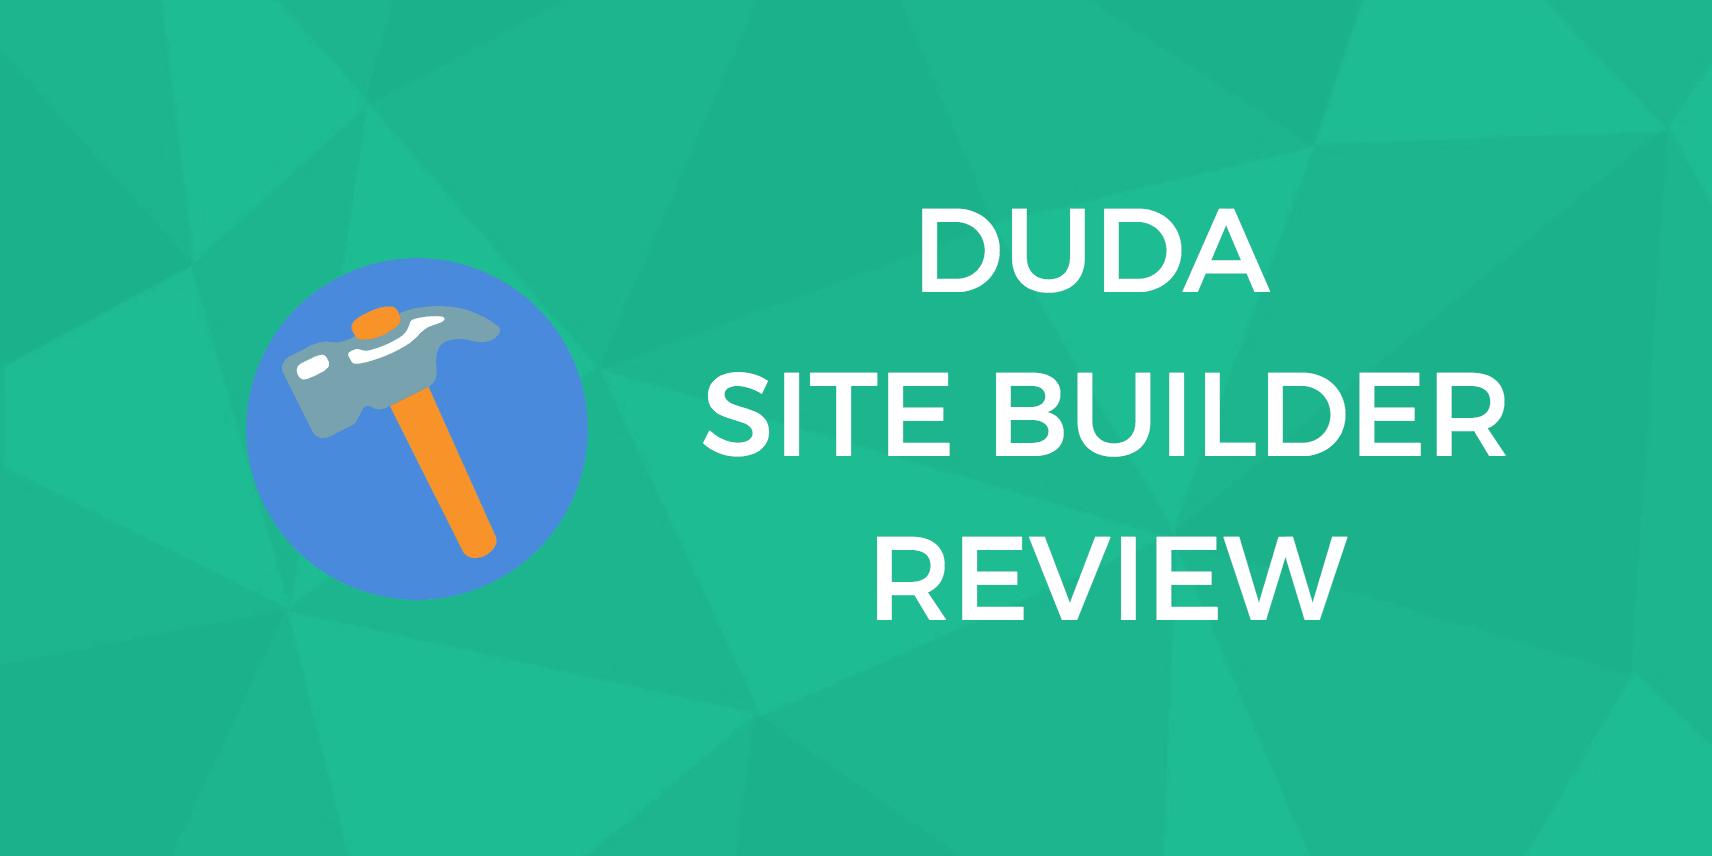 Duda Sitebuilder: Good for Agencies, Publishers, Hosts  But Is It